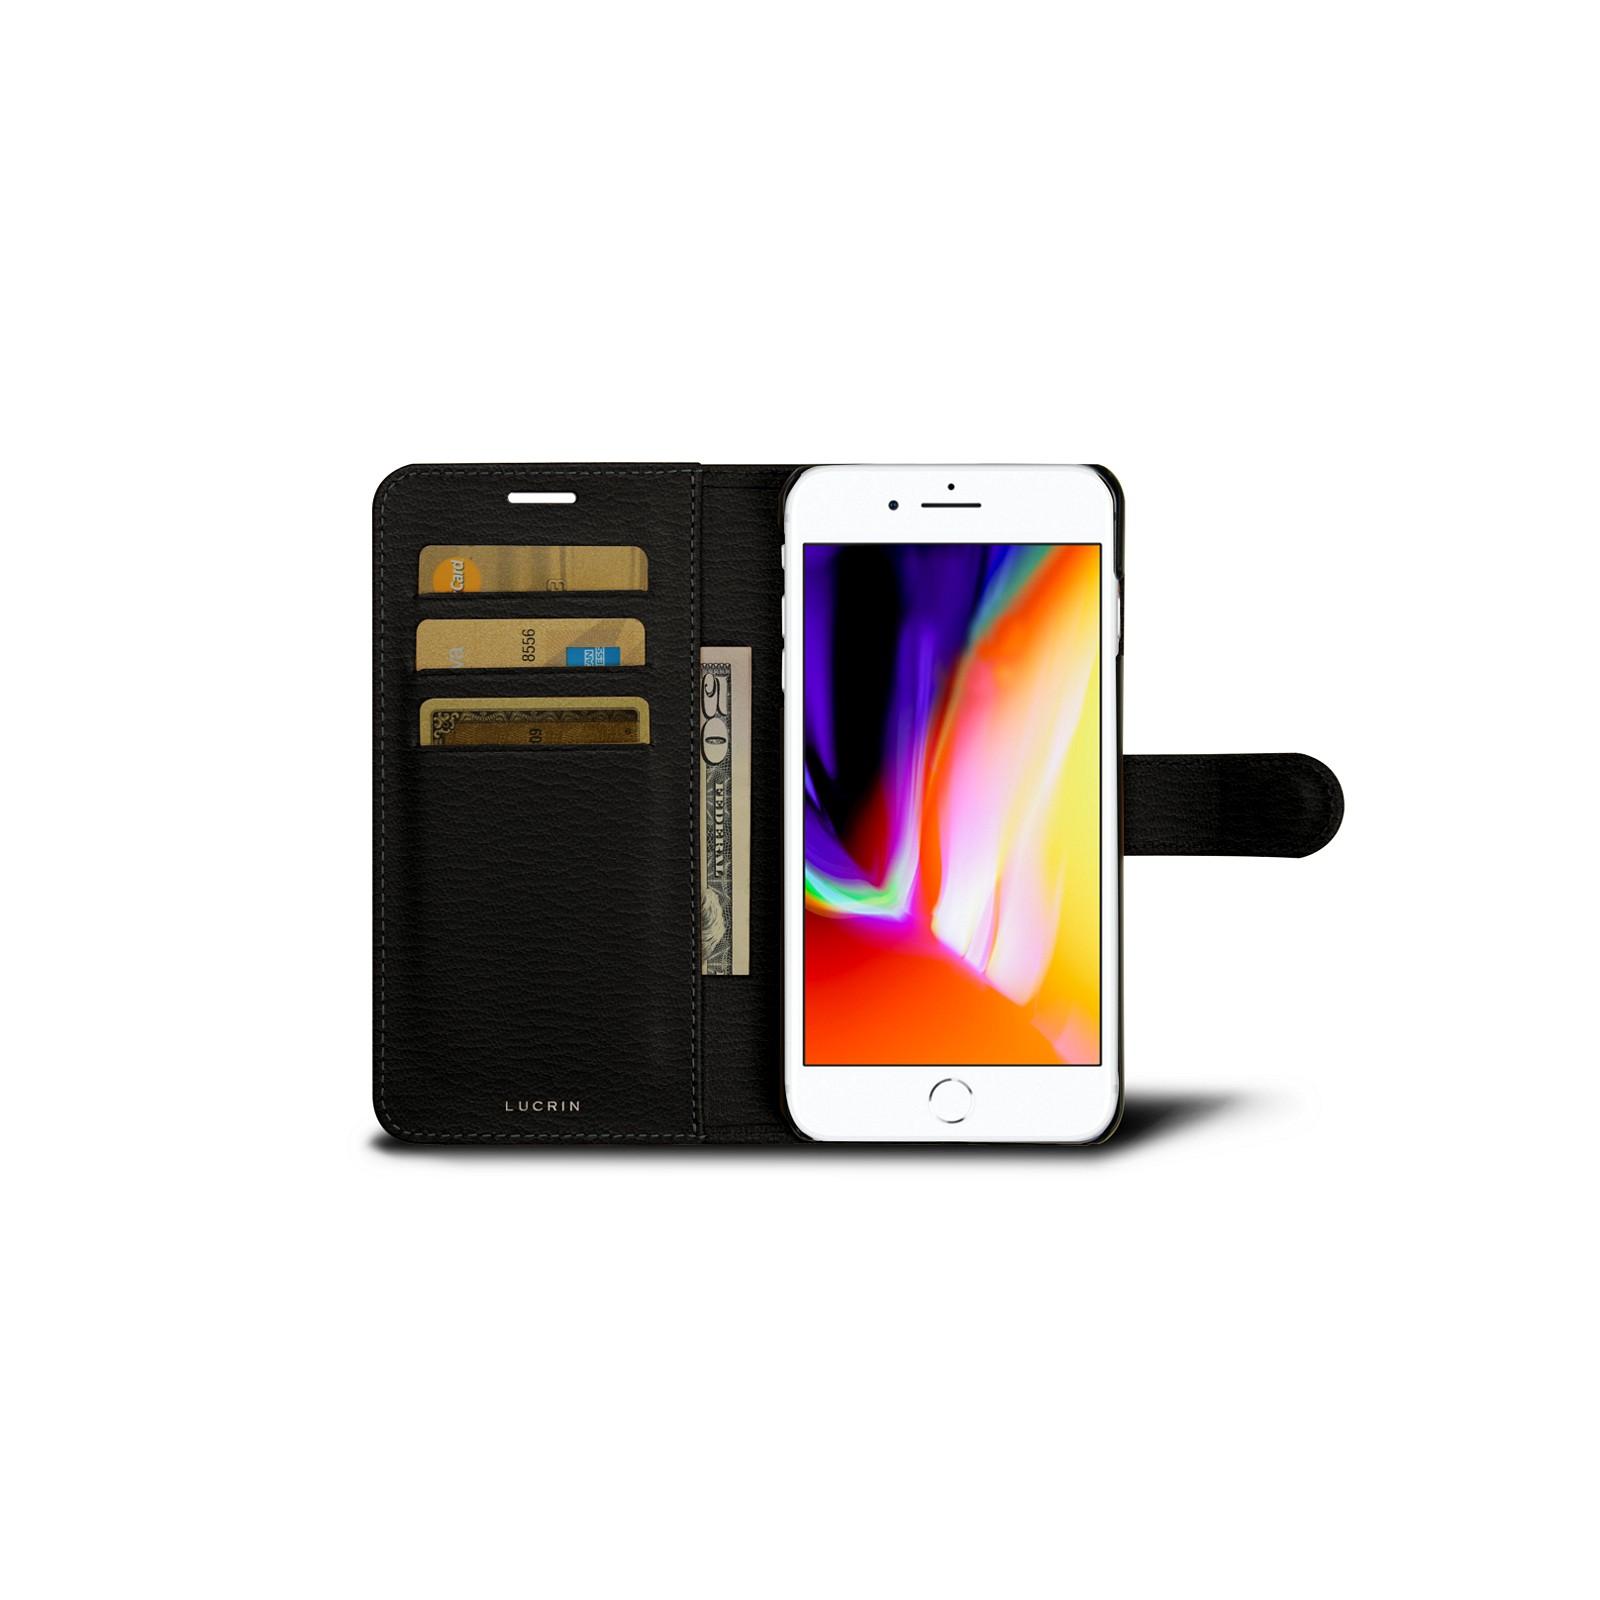 timeless design 60a9d 38040 iPhone 8 Plus wallet case